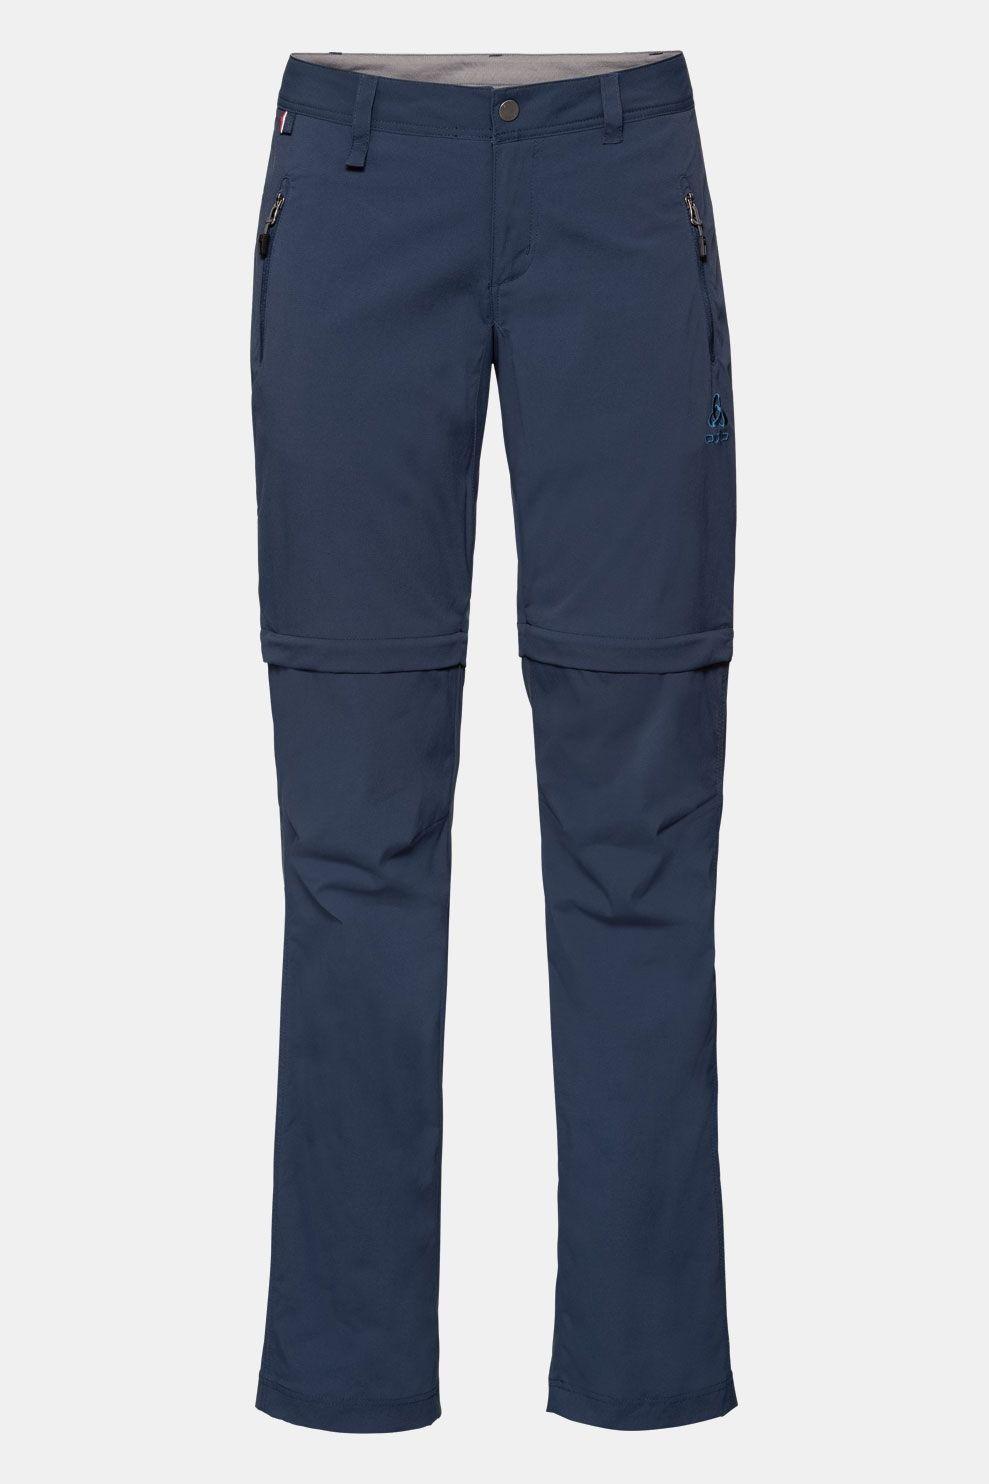 Odlo Afritsbare Wedgemount Broek Dames Donkerblauw Marineblauw